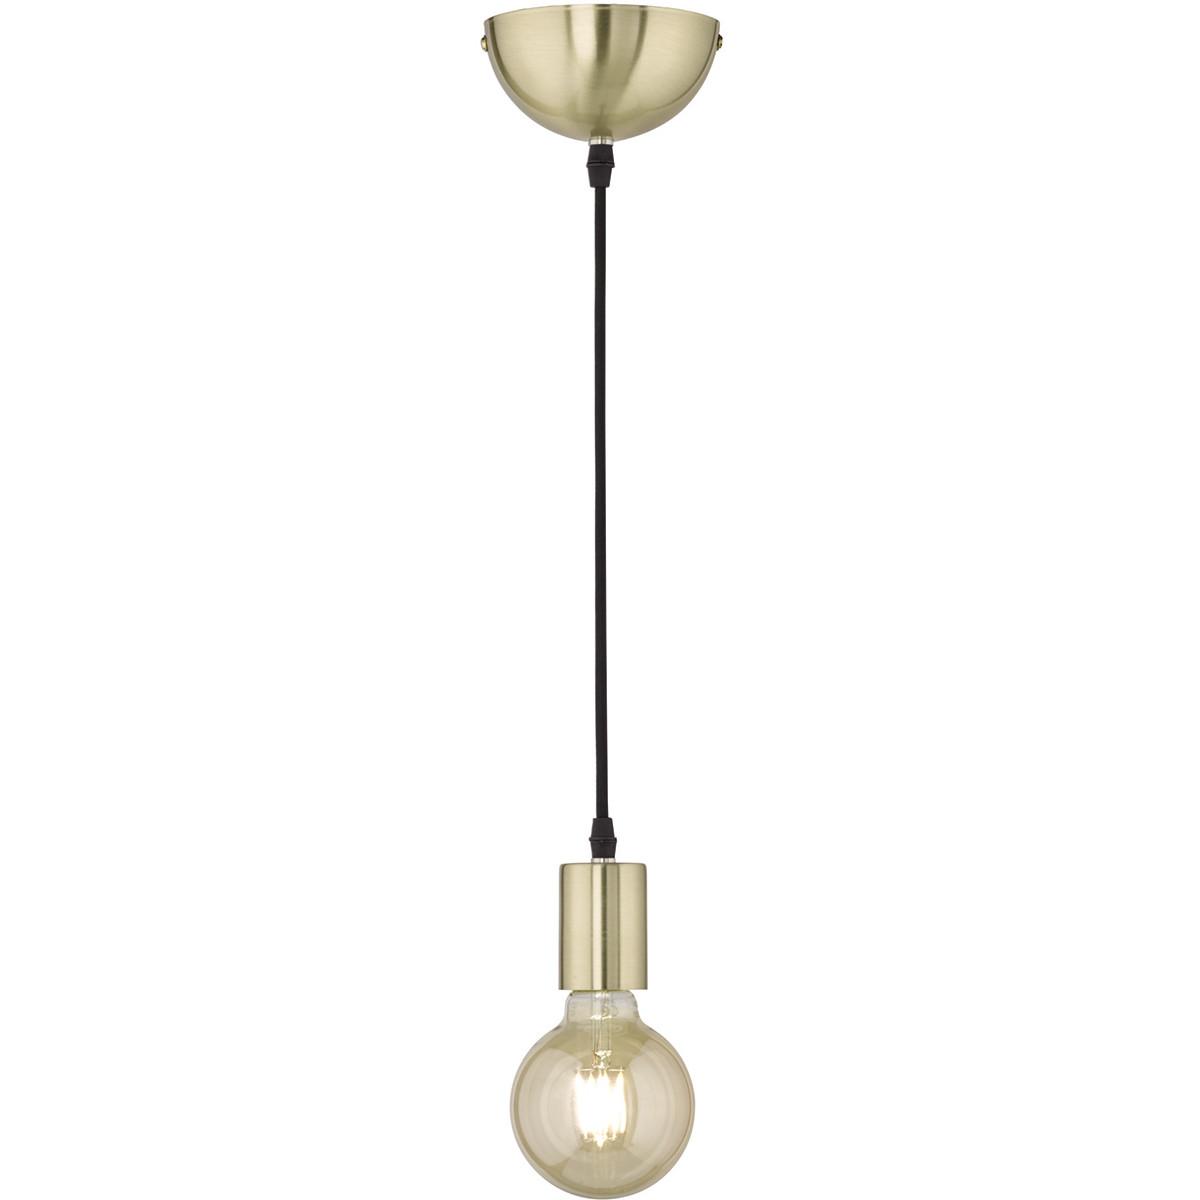 LED Hanglamp - Hangverlichting - Trion Cardino - E27 Fitting - 1-lichts - Rond - Mat Goud - Aluminiu